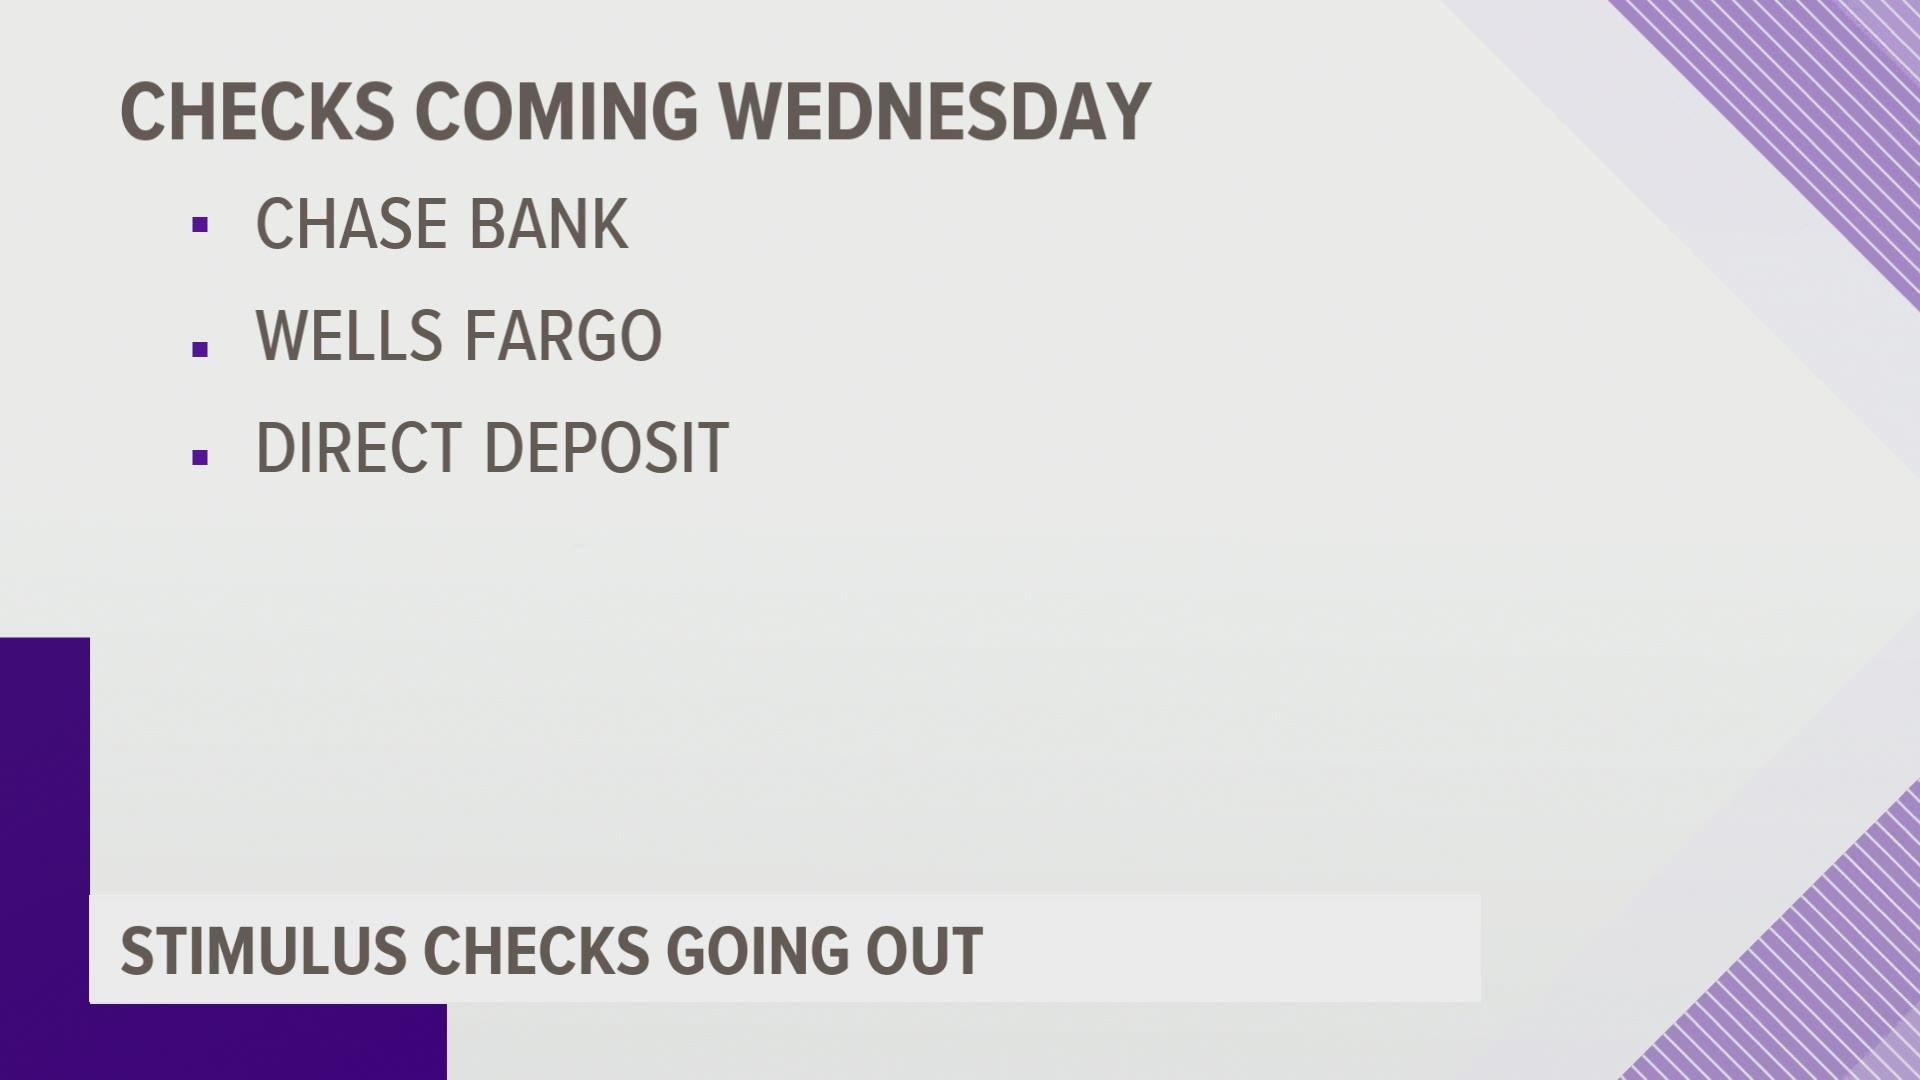 Third stimulus check update: How to track $1,400 payment status - weareiowa.com